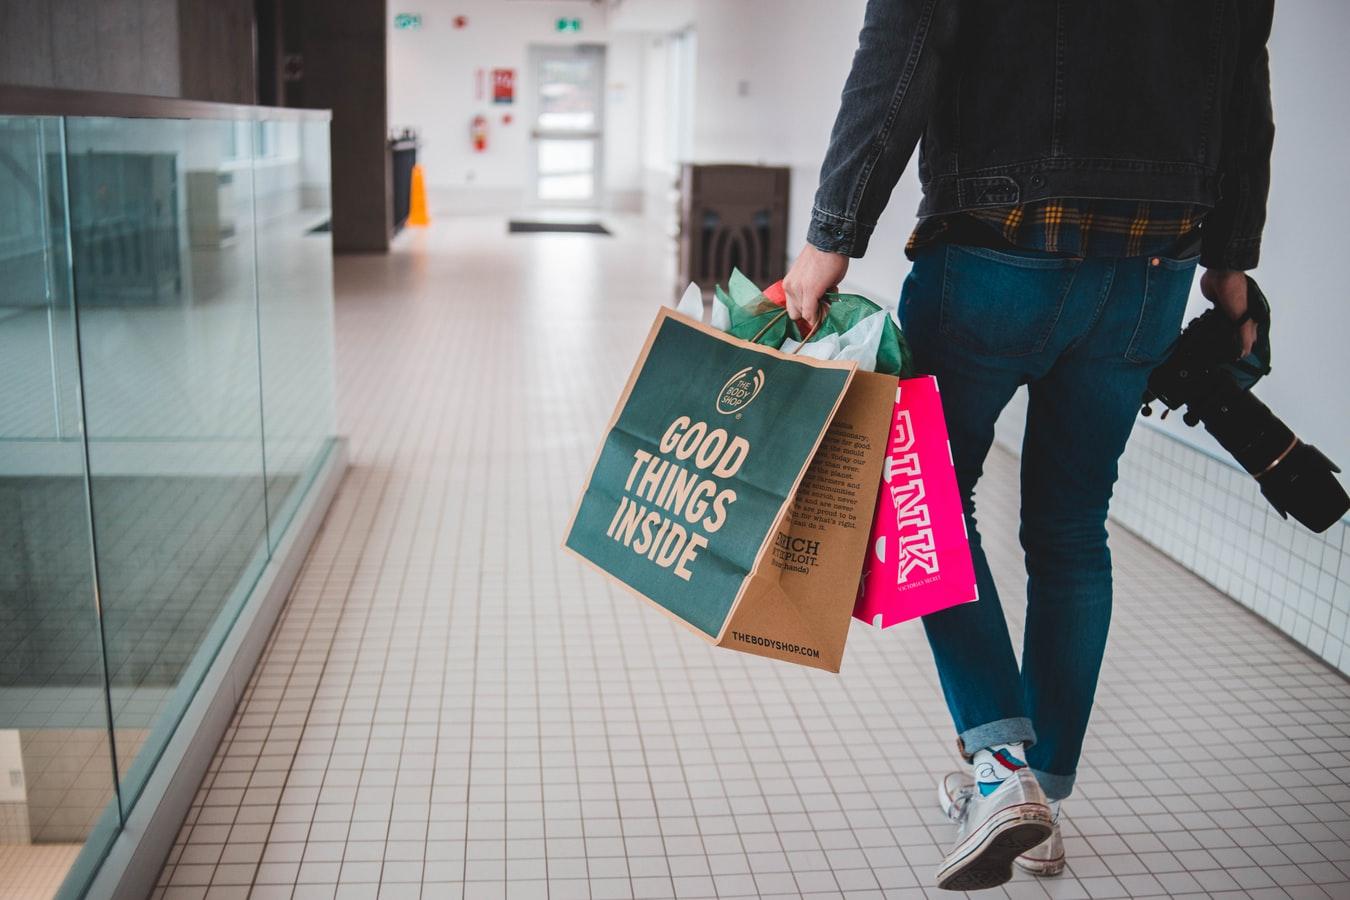 Le shopping